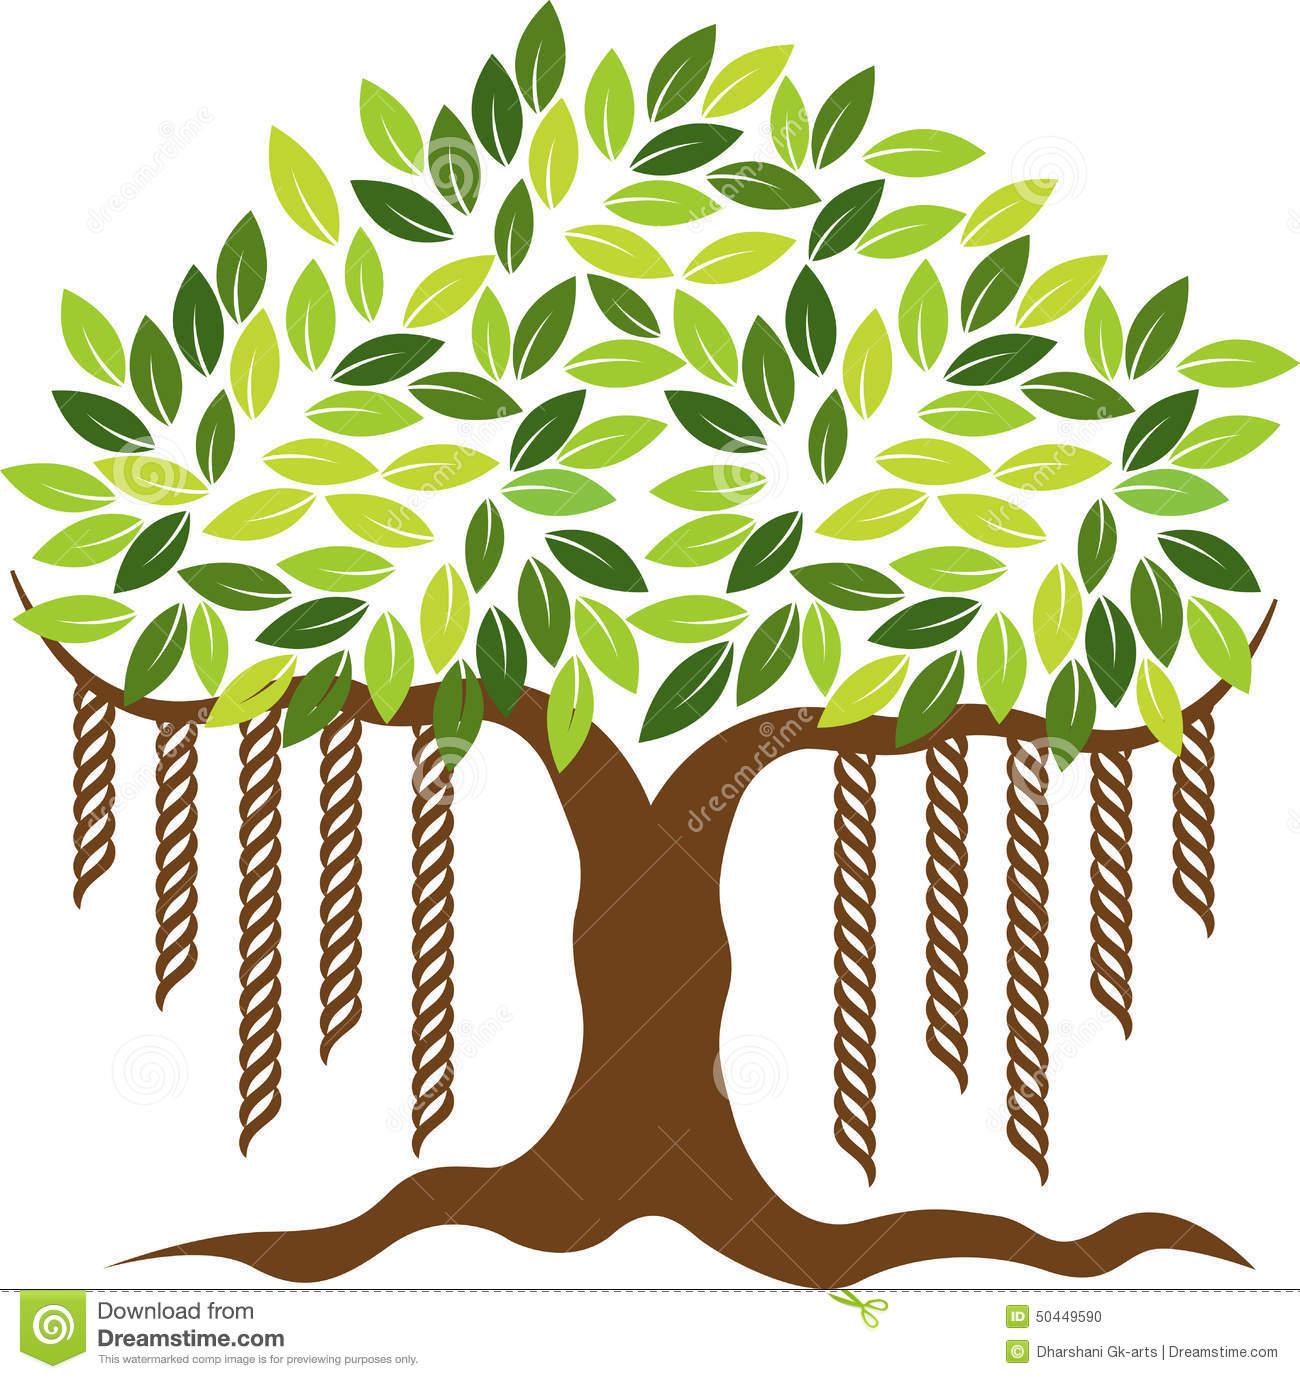 Banyan Tree Drawing at GetDrawings.com   Free for personal use ...